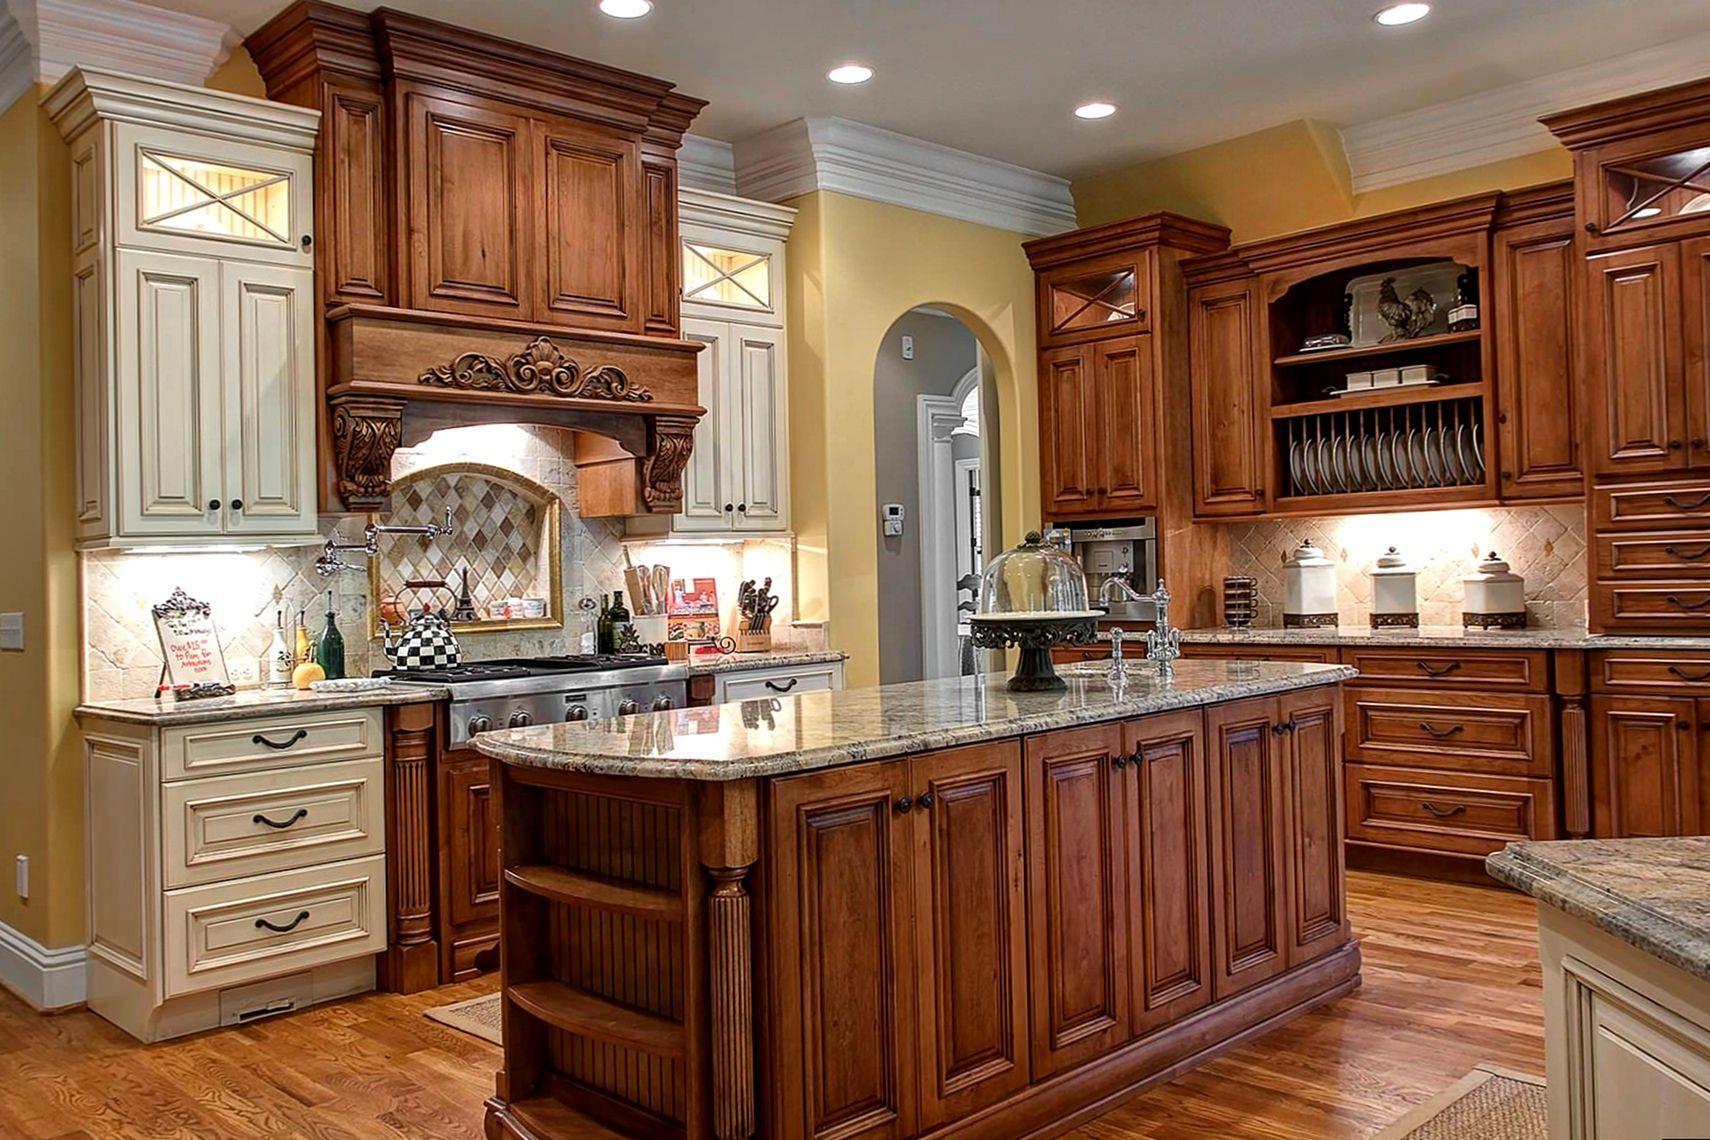 30 Stunning Wood Hood Kitchen Design Ideas For Inspiration